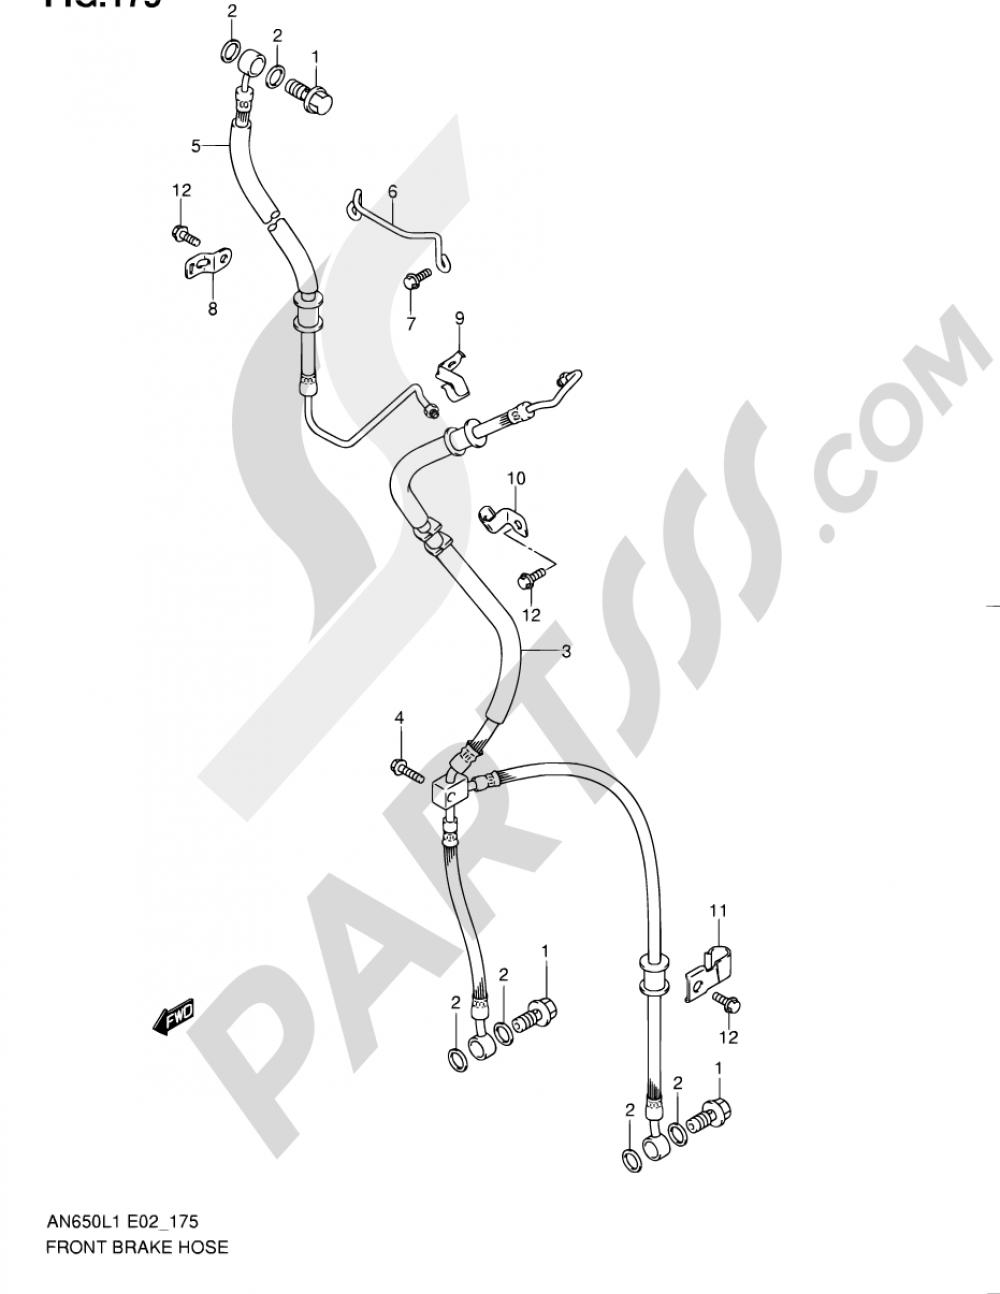 175 - FRONT BRAKE HOSE (AN650AL1 E51) Suzuki BURGMAN AN650 2011